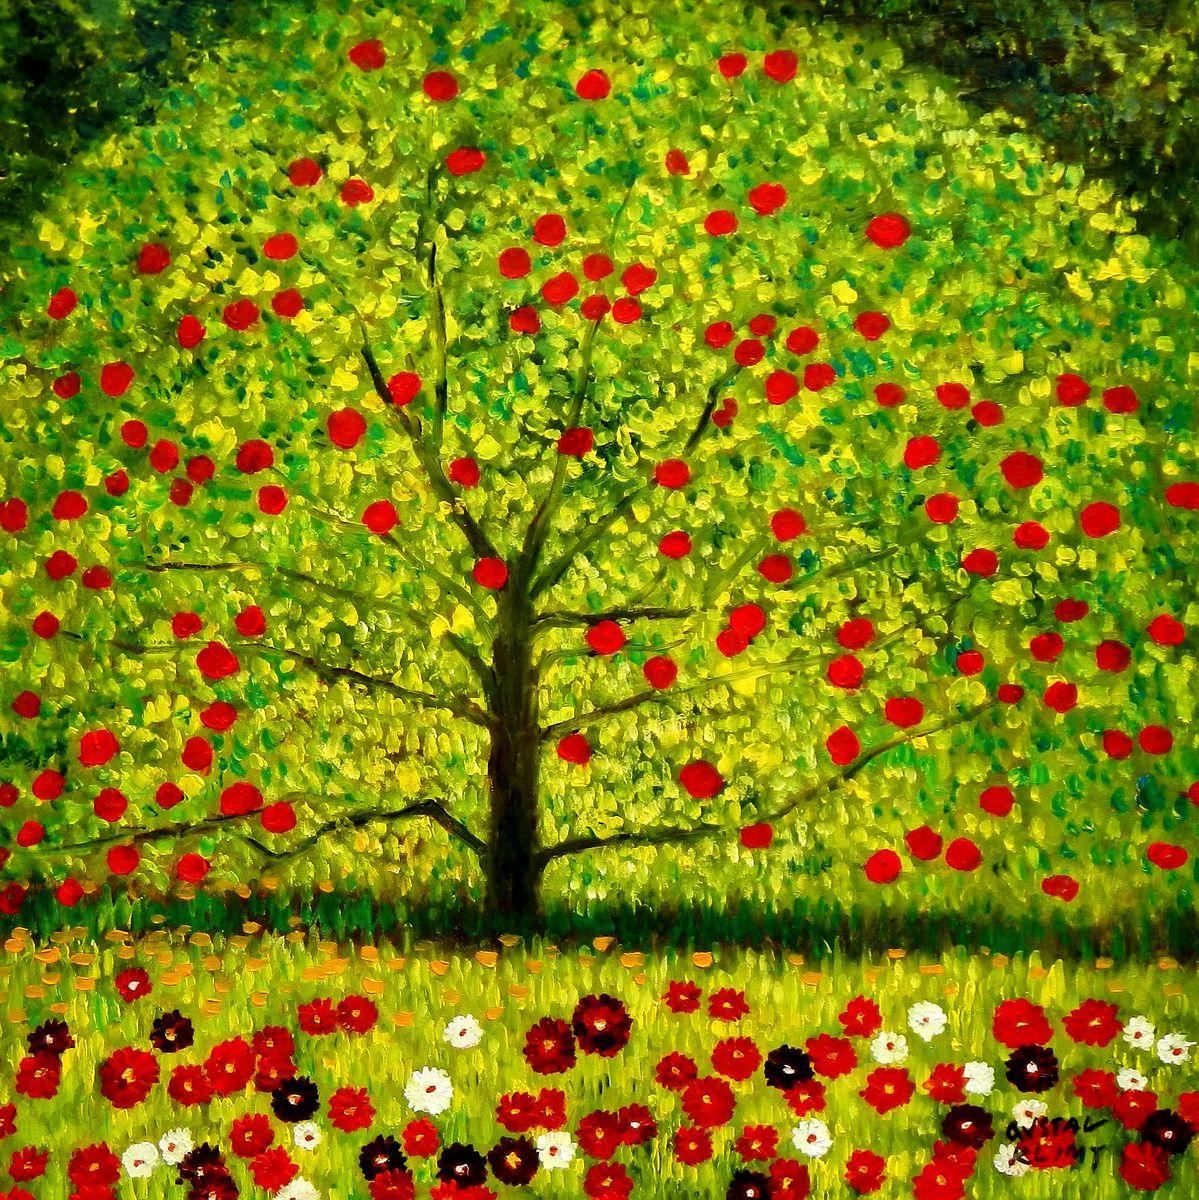 Gustav Klimt - Der Apfelbaum g95867 80x80cm bemerkenswertes Ölgemälde handgemalt